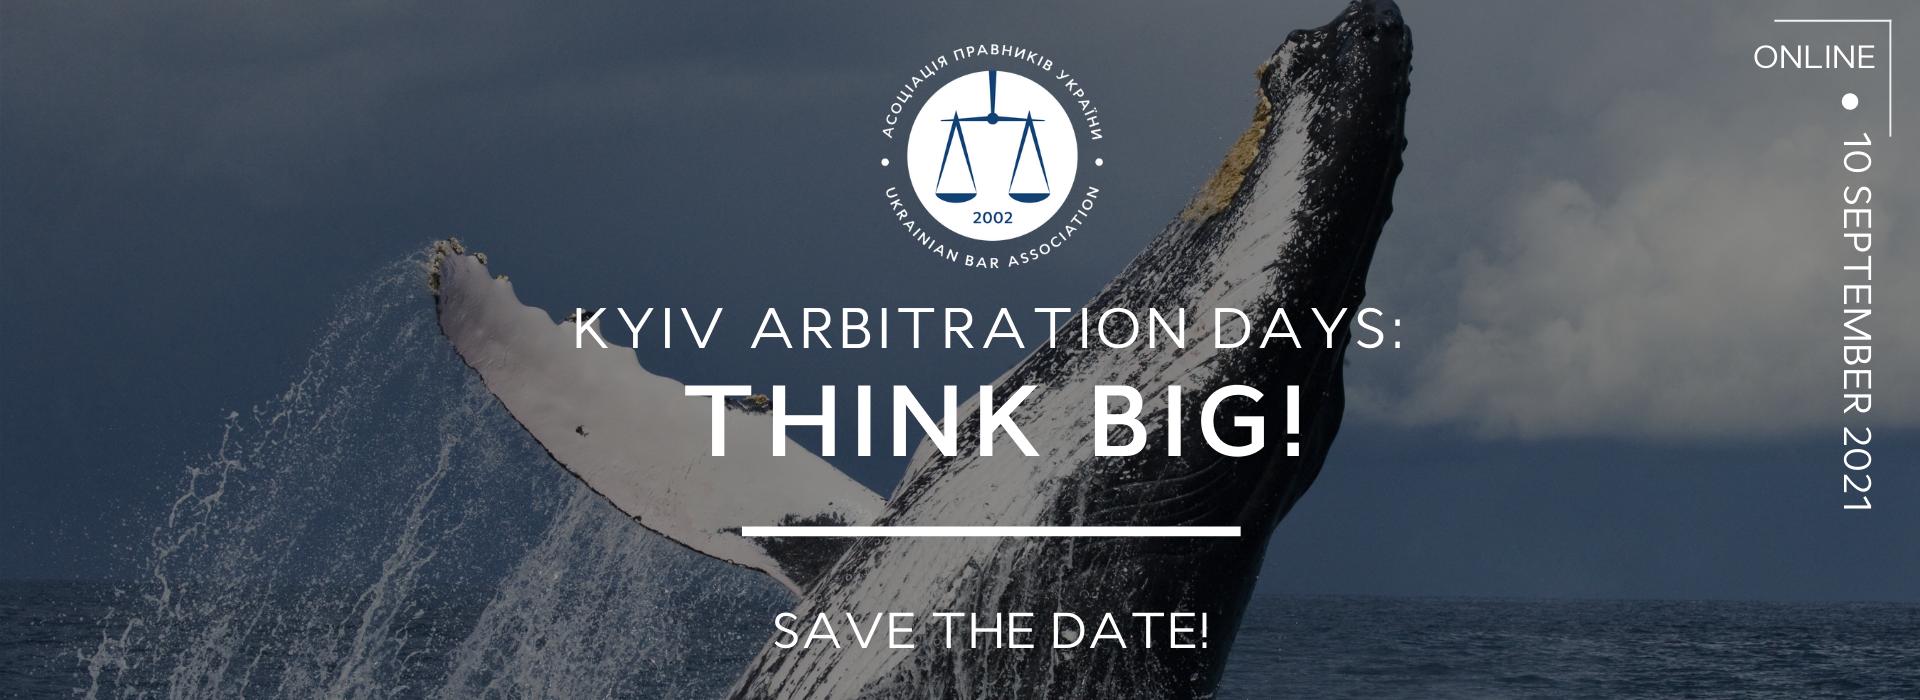 Kyiv Arbitration Days 2021: Think Big!